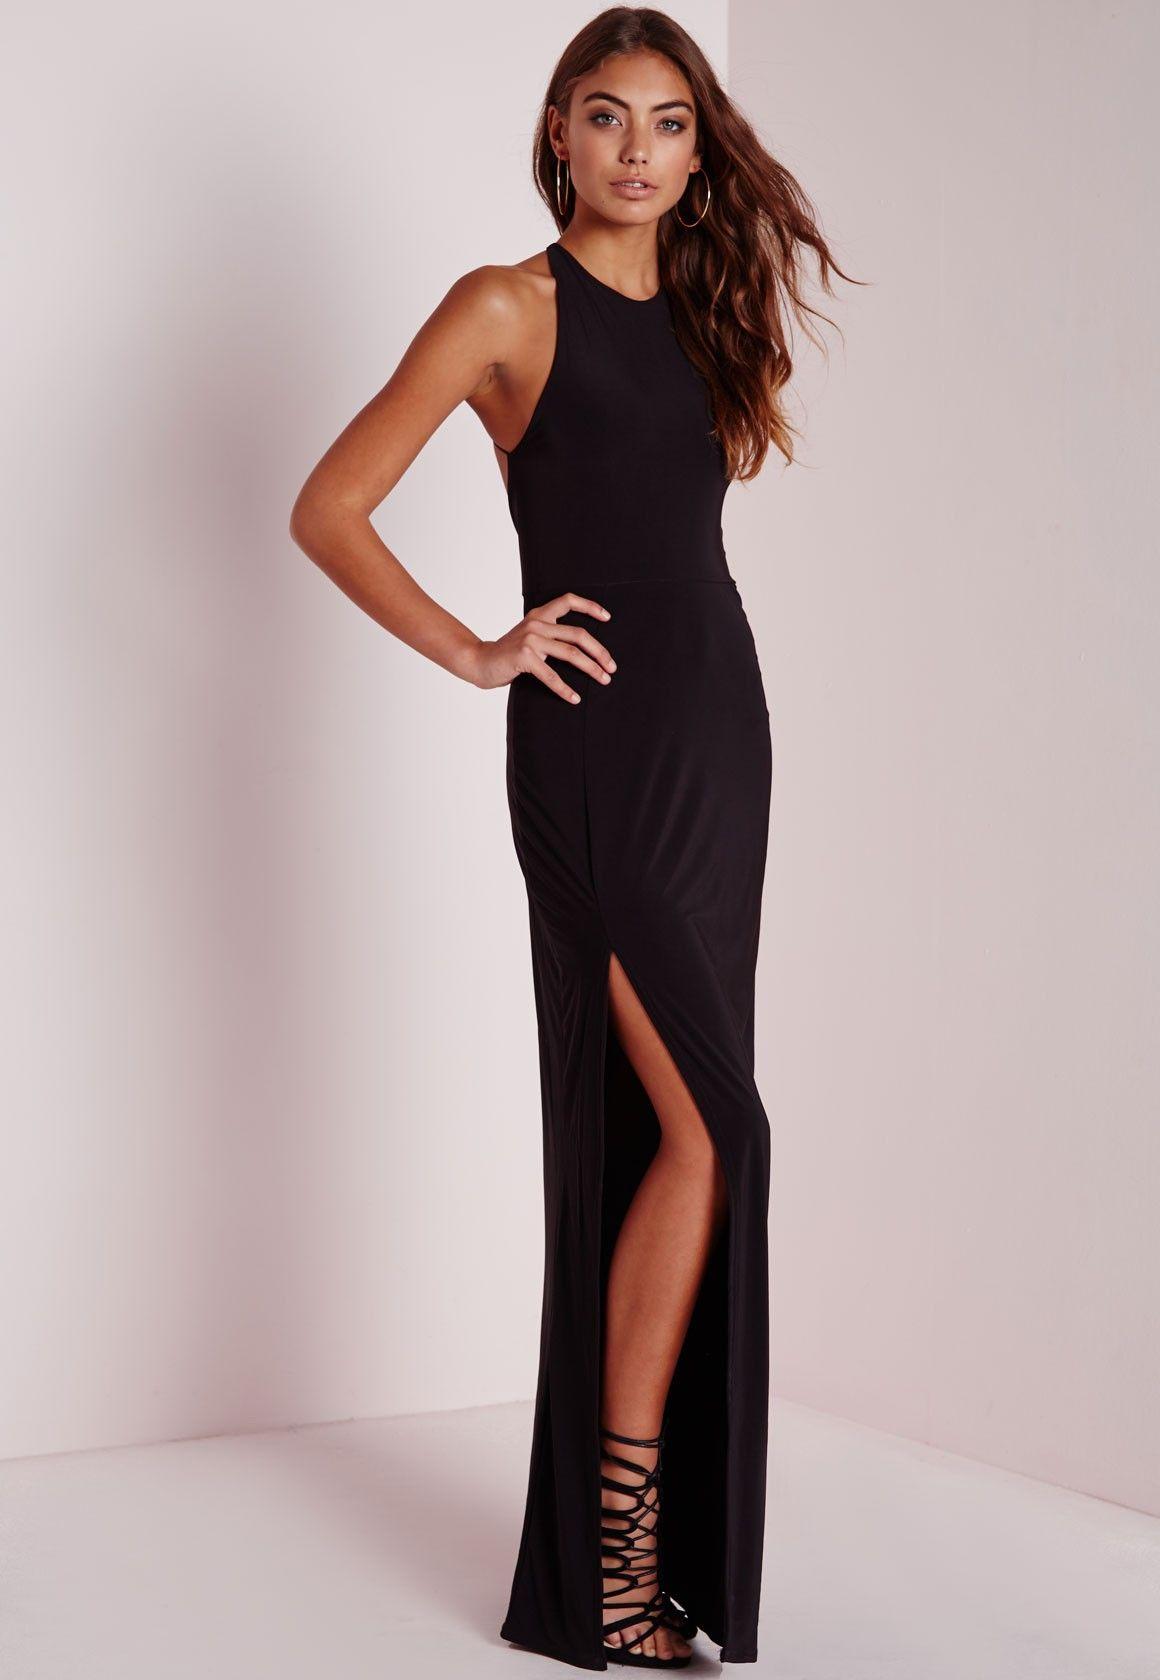 Black dress goals - Petite Slinky Side Split Maxi Dress Black Petite Petite Dresses Missguided